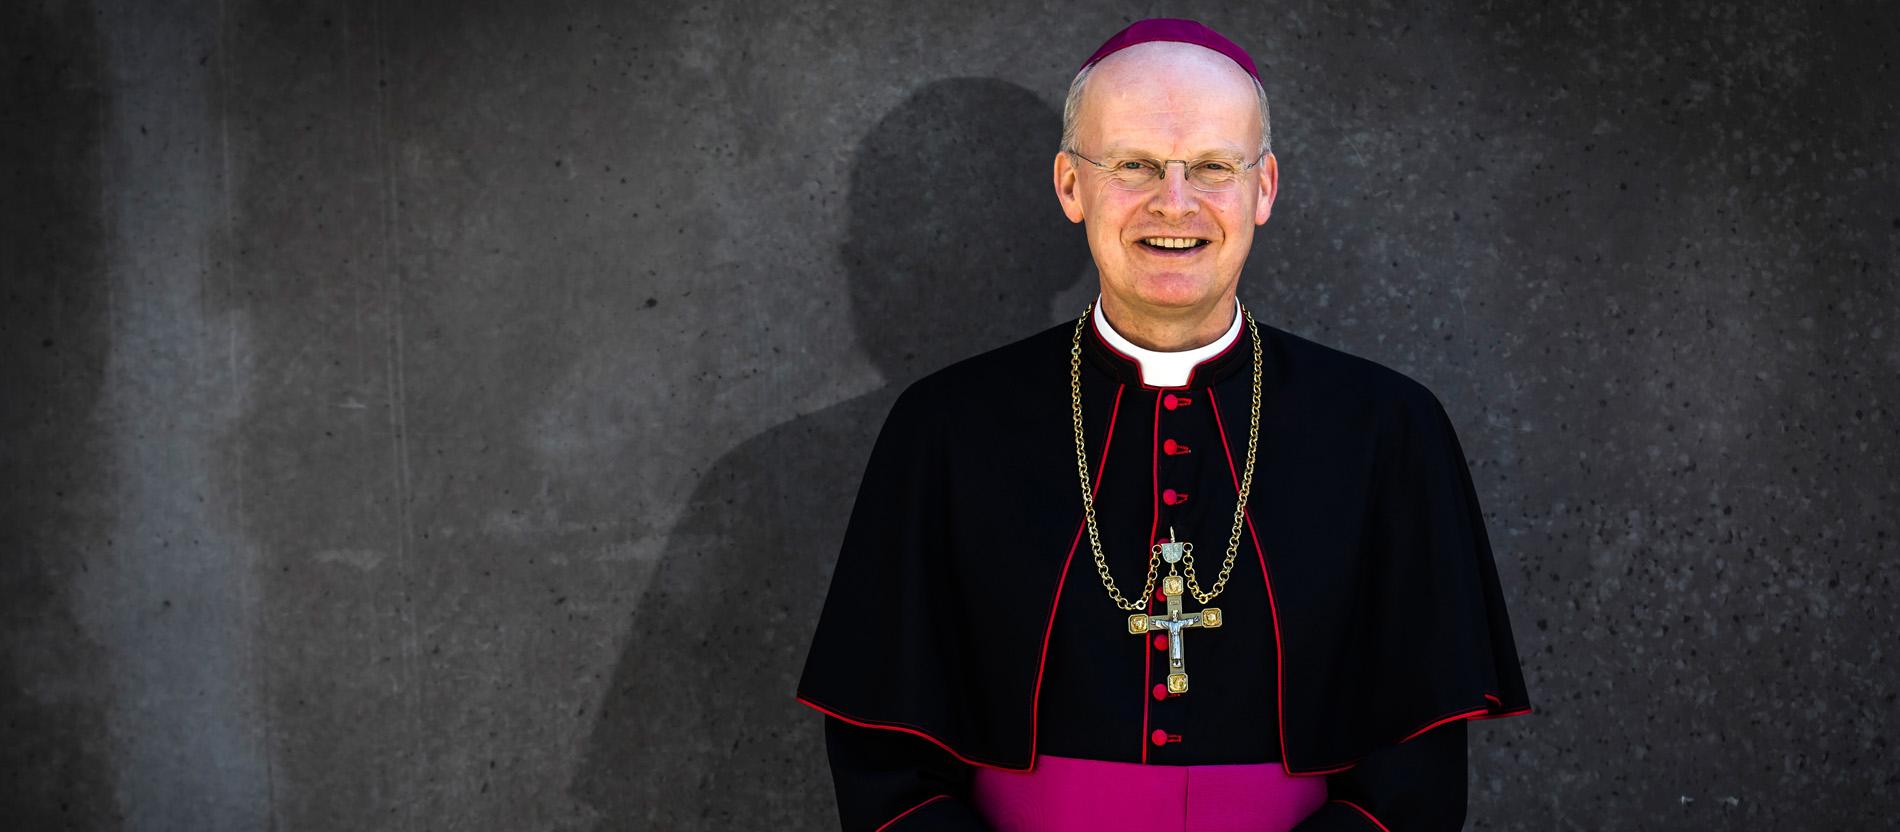 Overbeck Eine Neue Spiritualitat Durch Corona Katholisch De